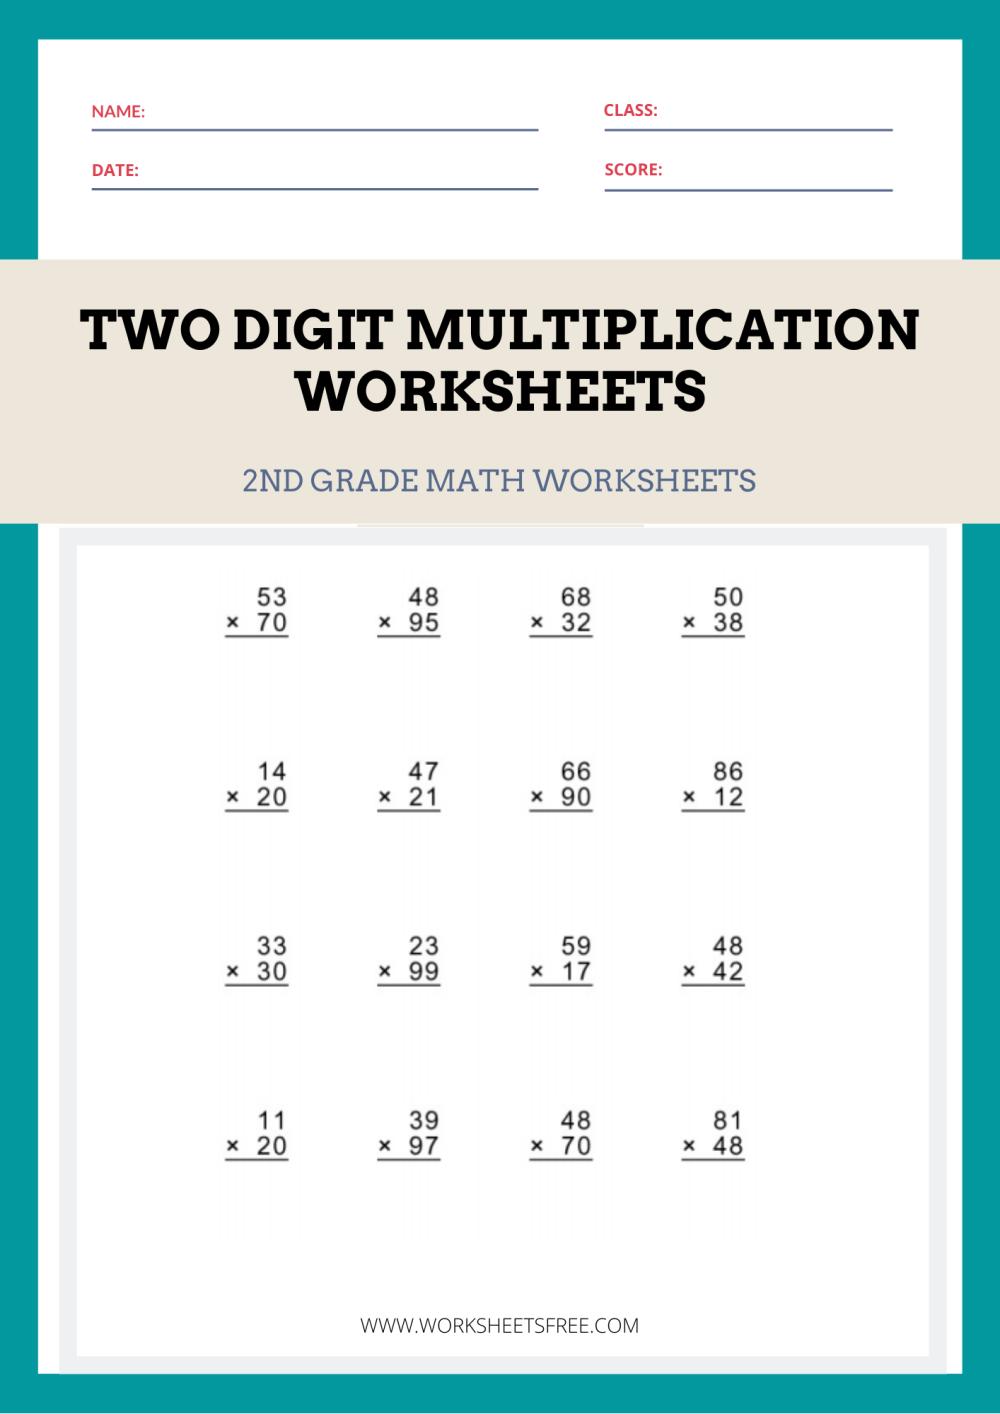 medium resolution of Two-Digit-Multiplication-Worksheets   Worksheets Free